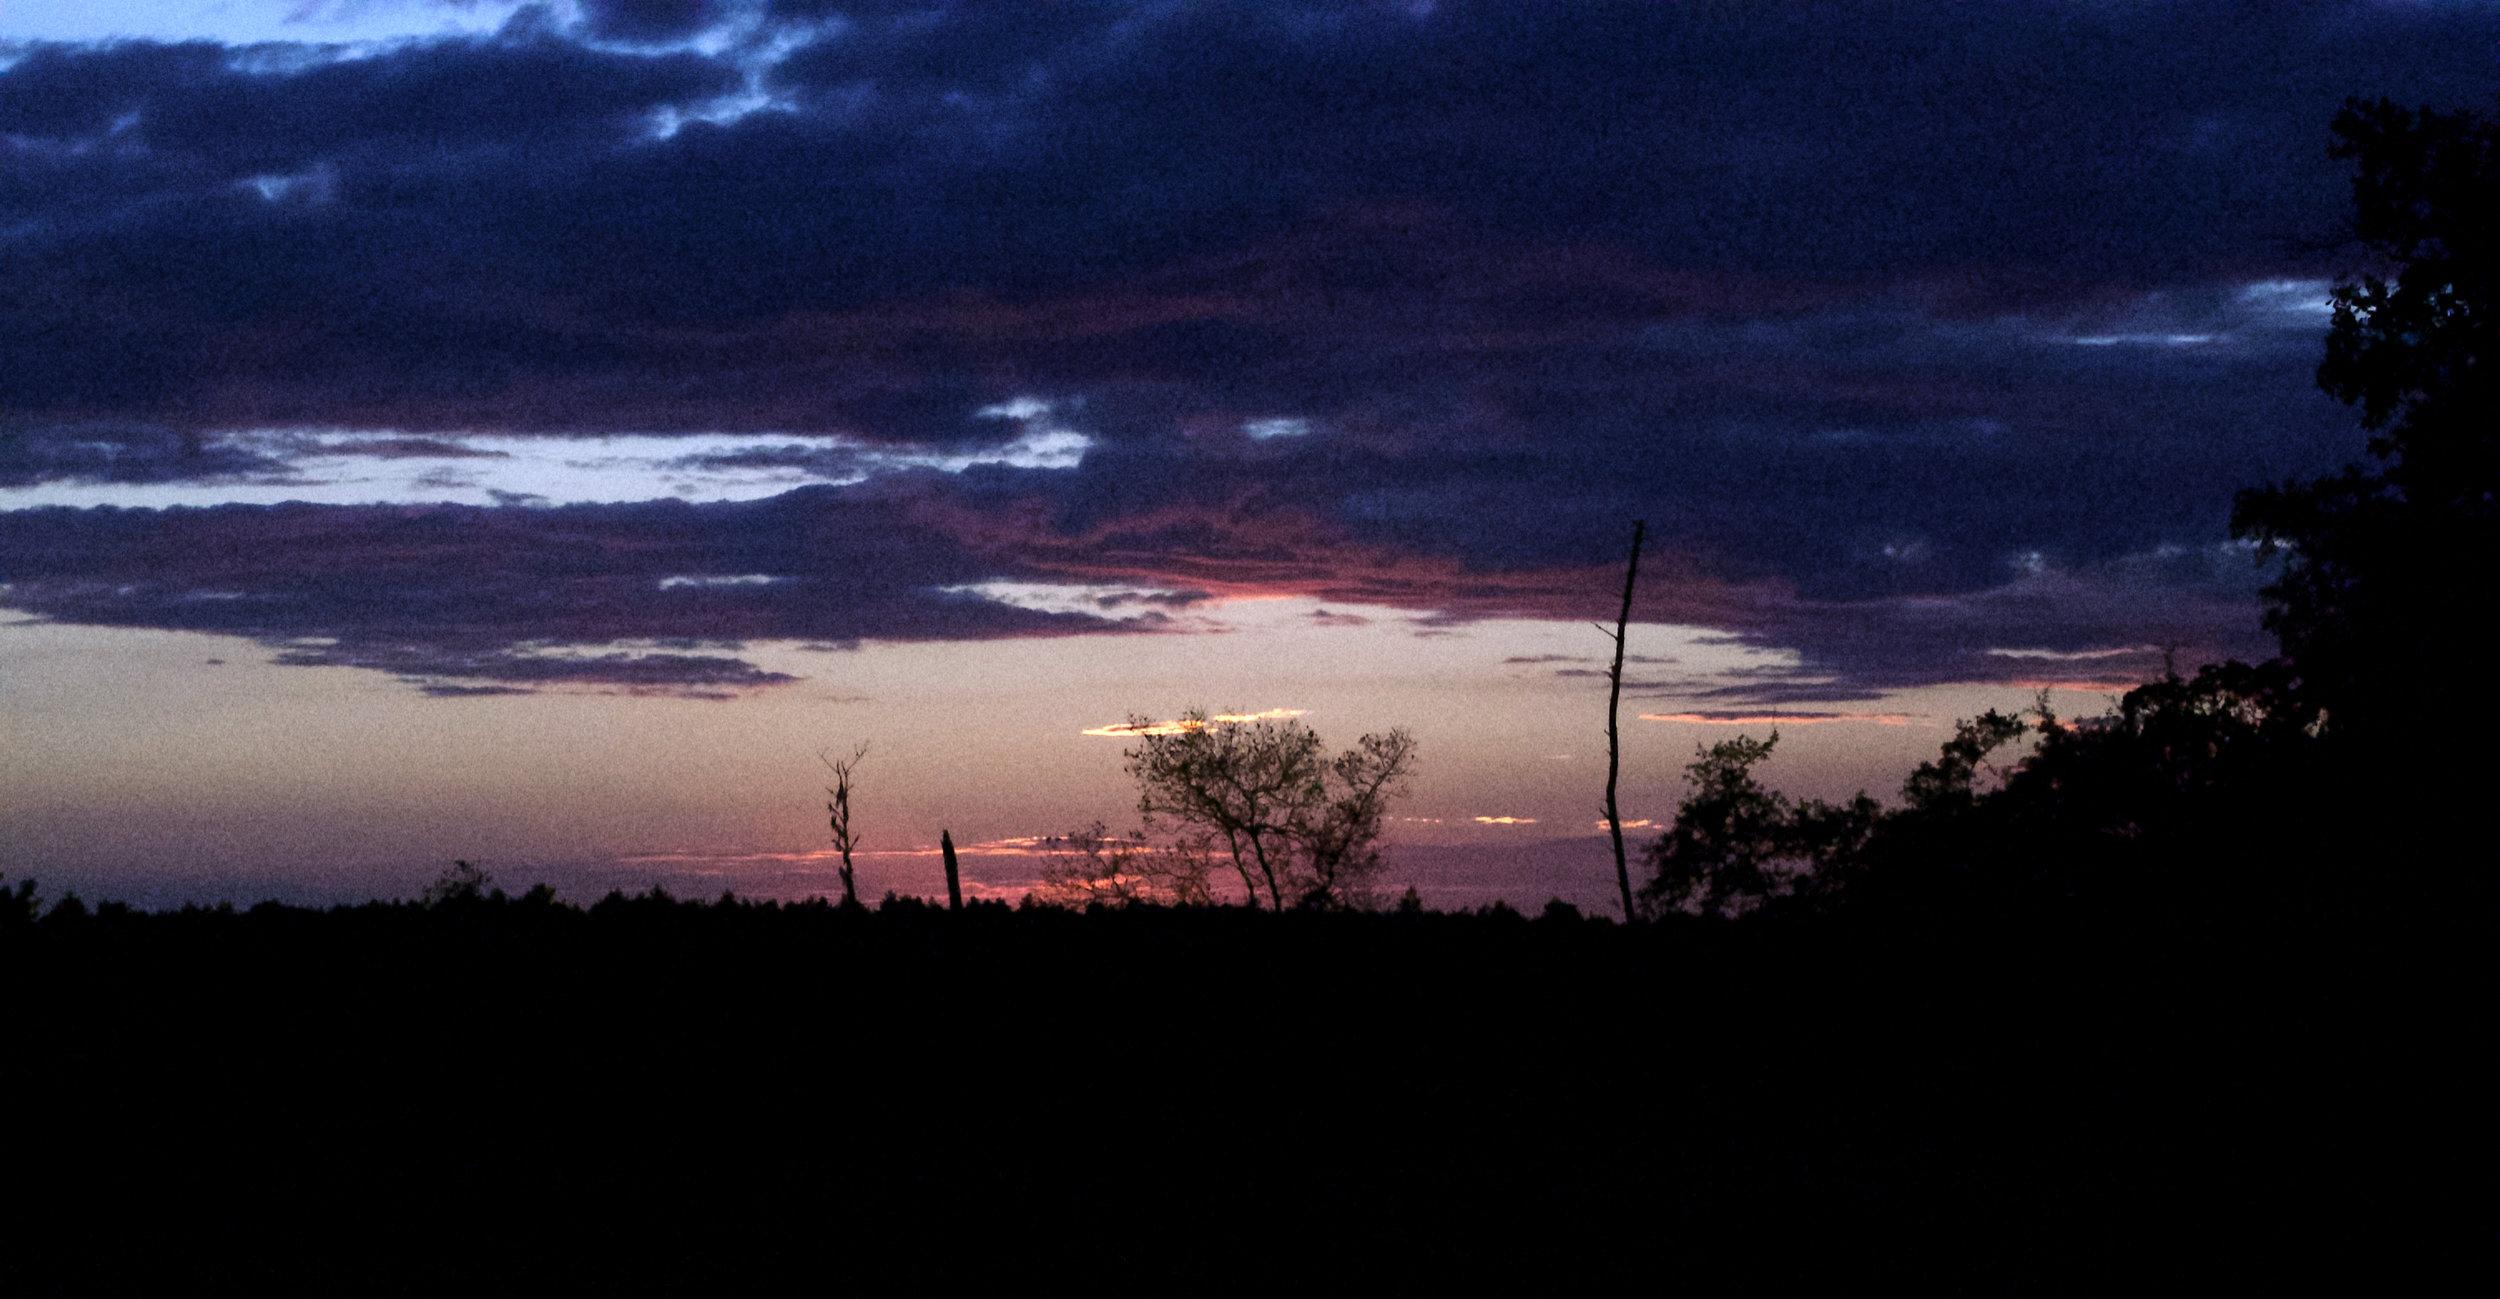 Sunset off Highway 19. Ocala Natl Forest, FL, 2016. Photo Credit: Stephen Feibelman